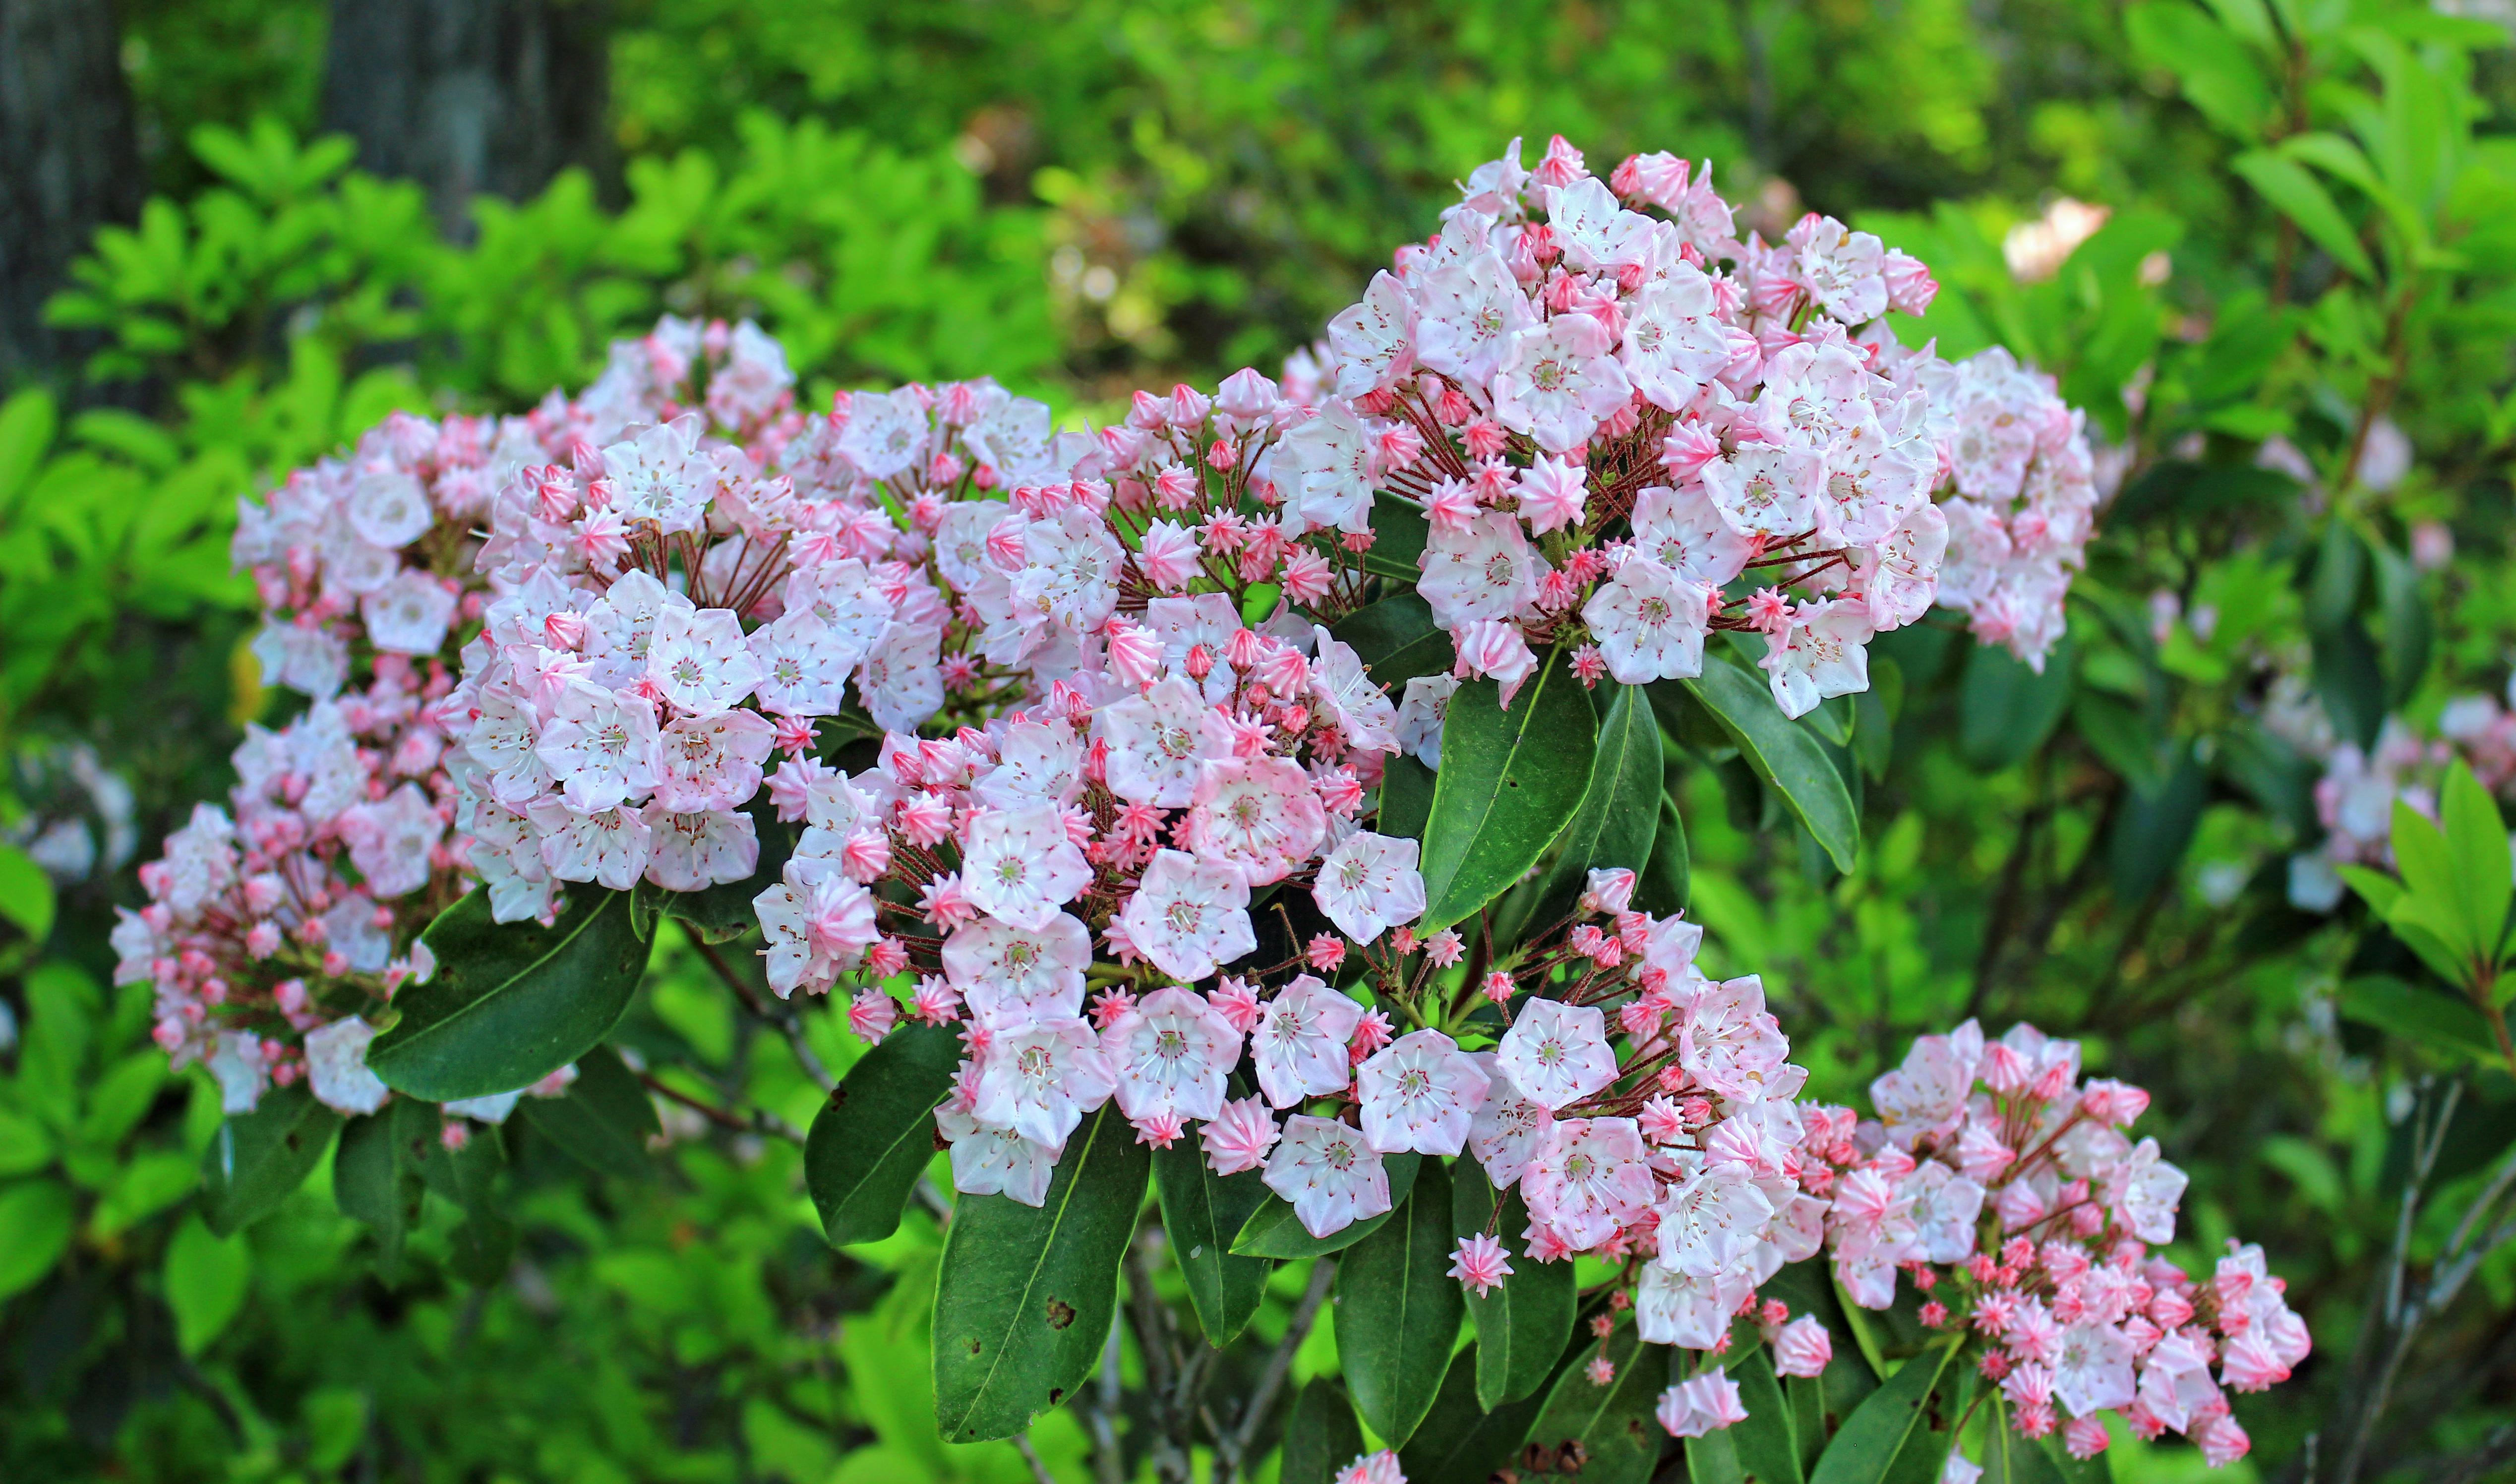 banco de imagens natureza ramo flor plantar flor vero botnica jardim flora flores silvestres flores sai cc domnio pblico arbusto